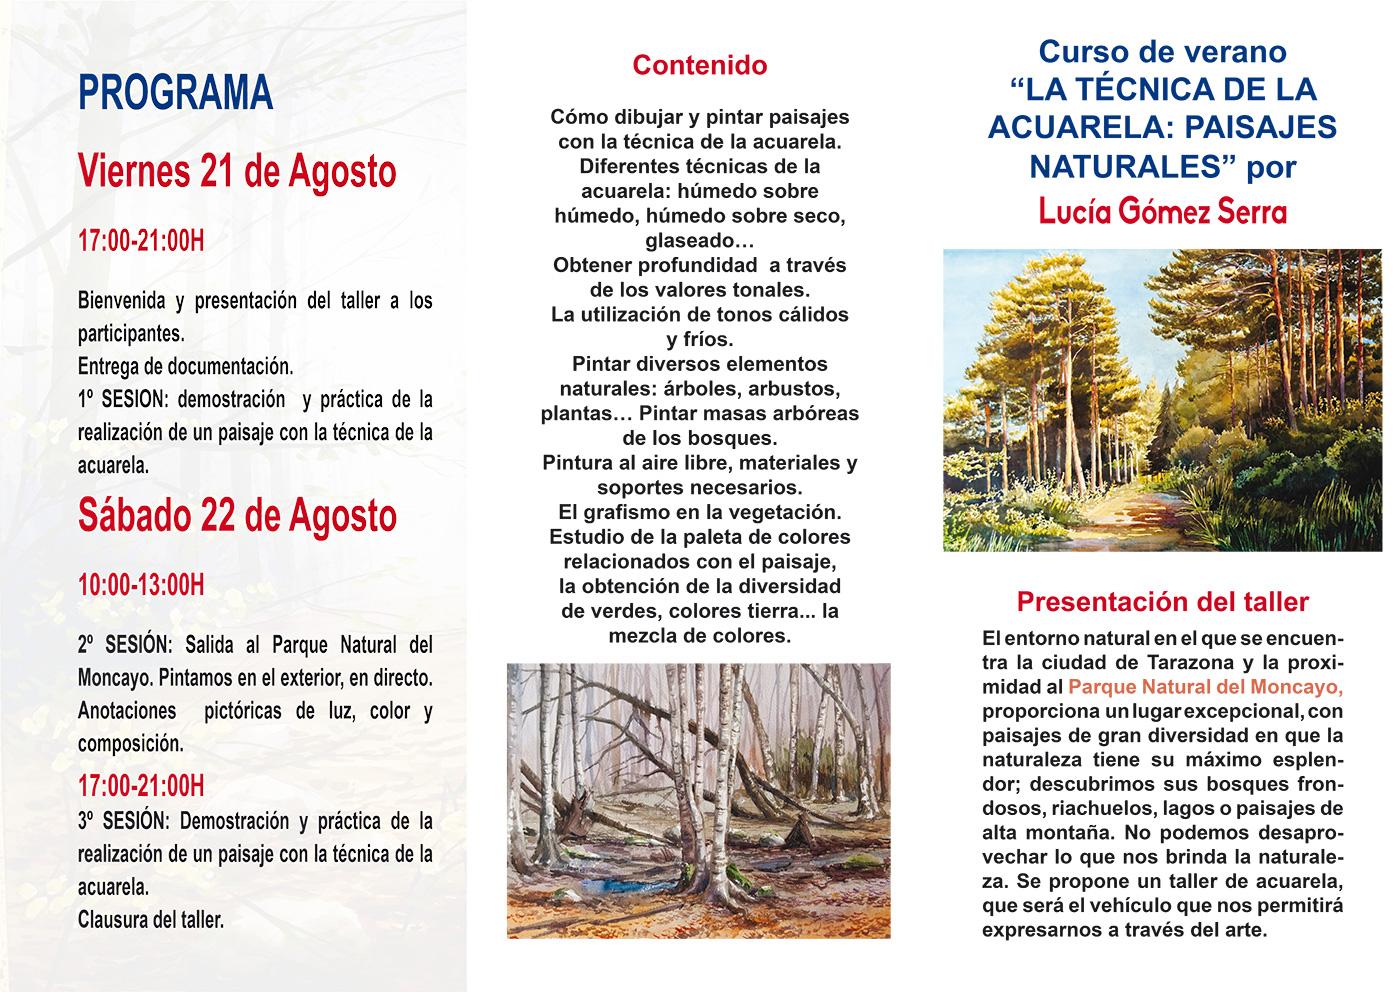 Paisajes naturales - Programa